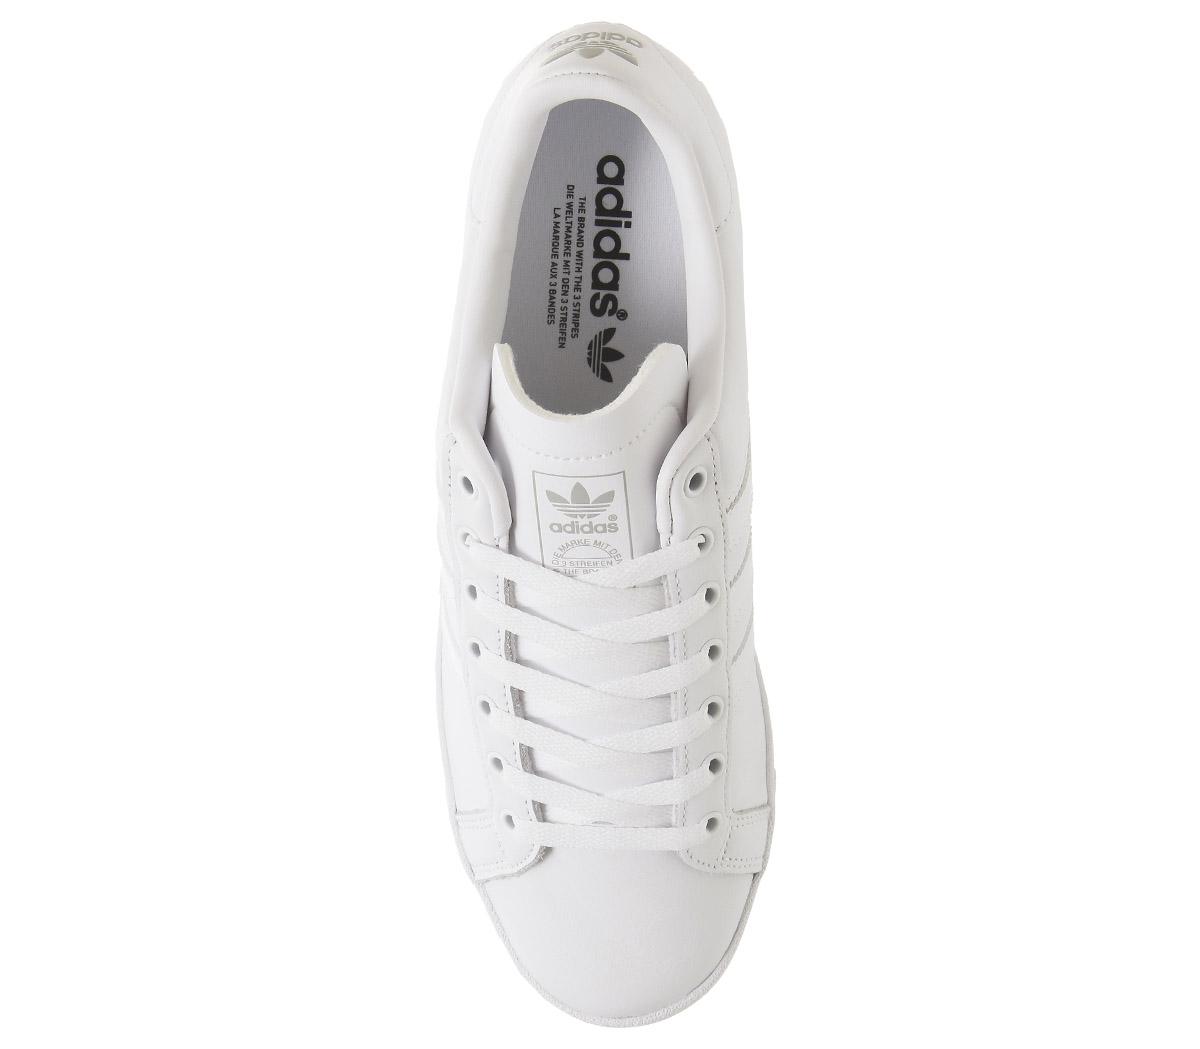 Adidas-Coast-Star-Baskets-Blanc-Baskets-Chaussures miniature 10